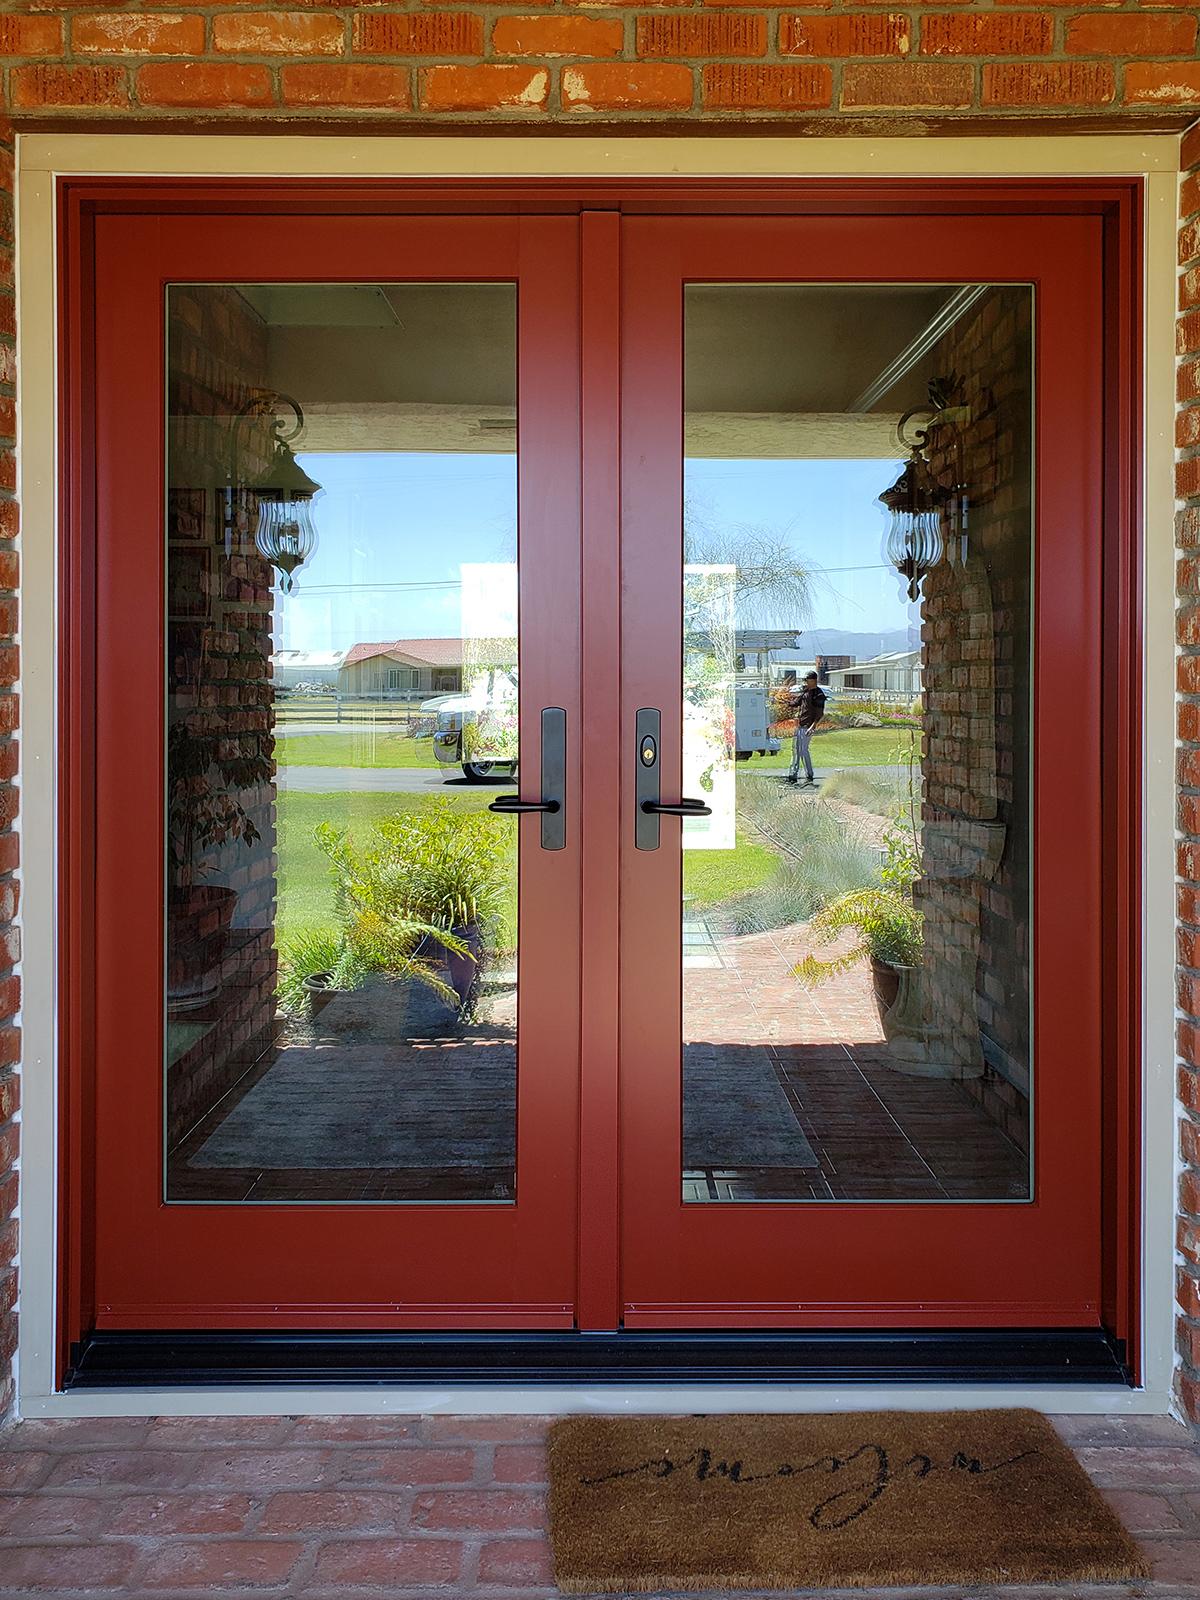 Lighthouse Windows Salinas jeld wen siteline entry door exterior view 1